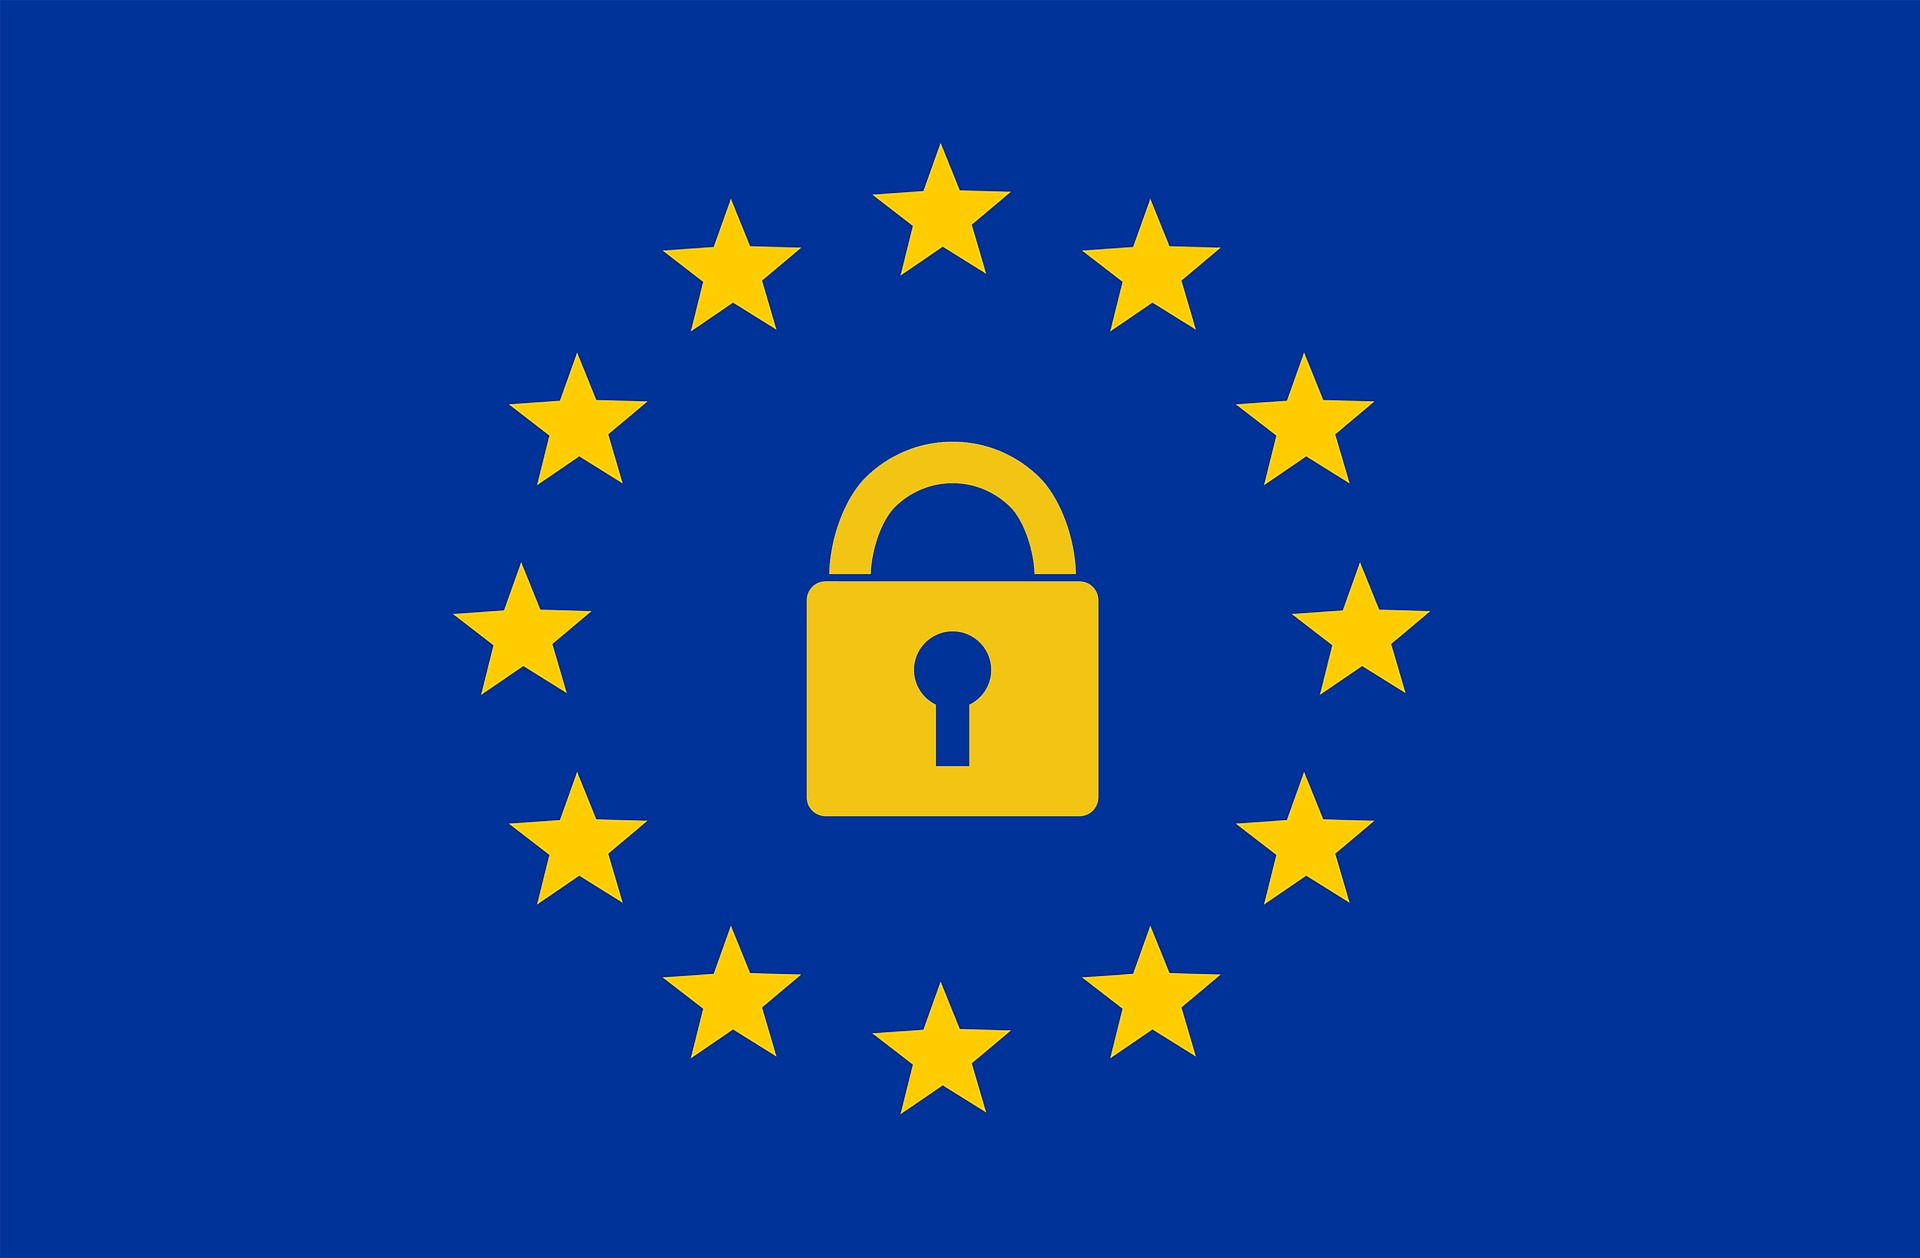 Vlag AVG/GDPR Europa